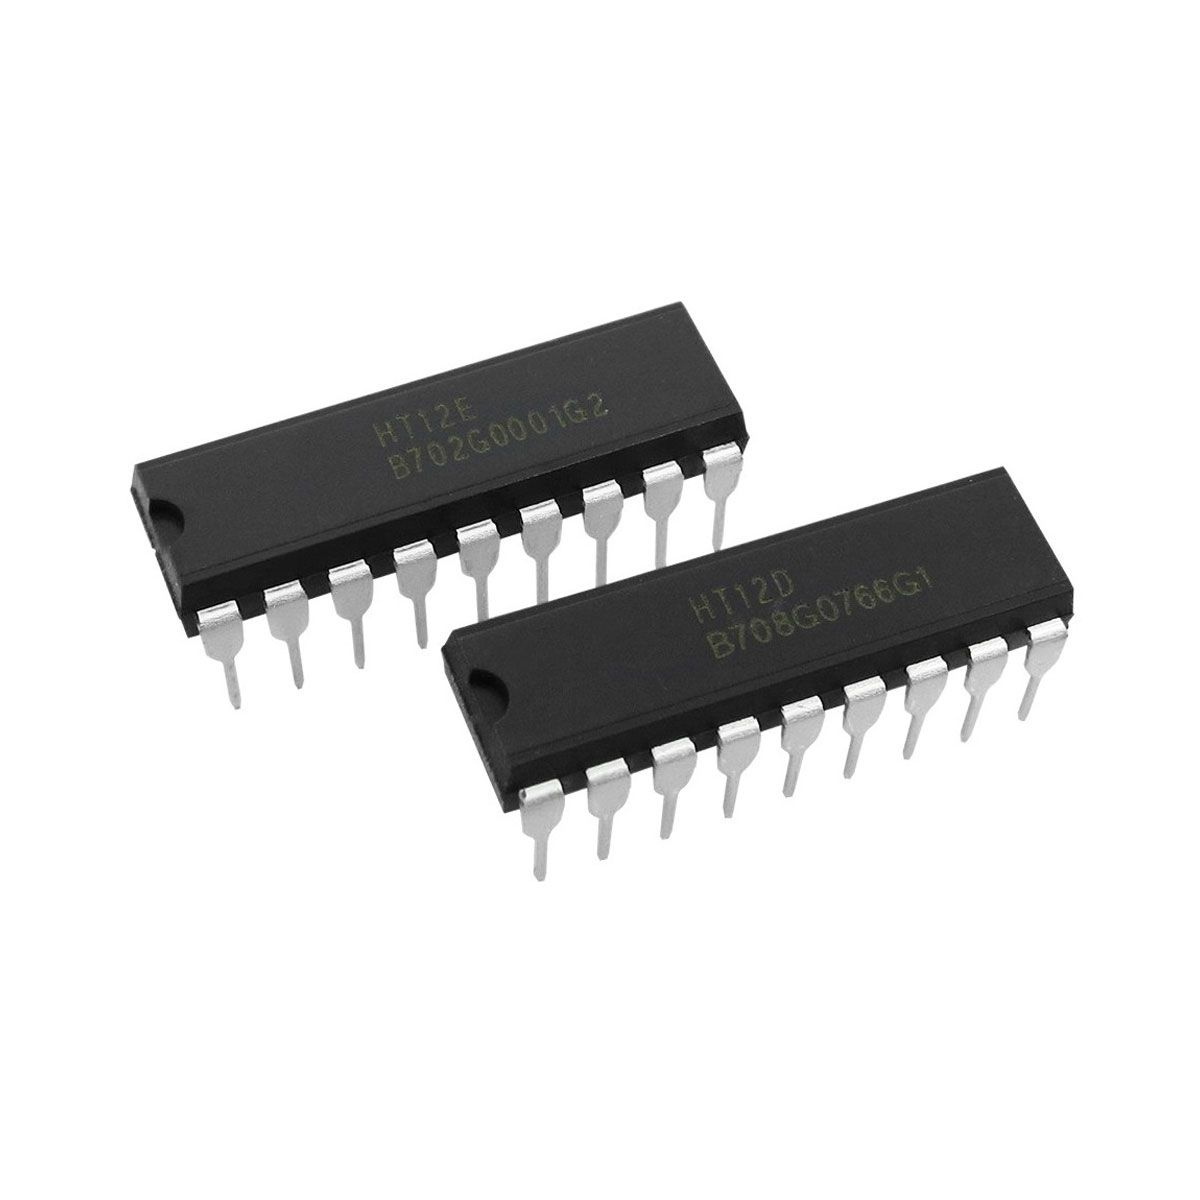 Kit Módulo RF Transmissor e Receptor 433mhz AM + Kit HT12E e HT12D Encoder e Decoder